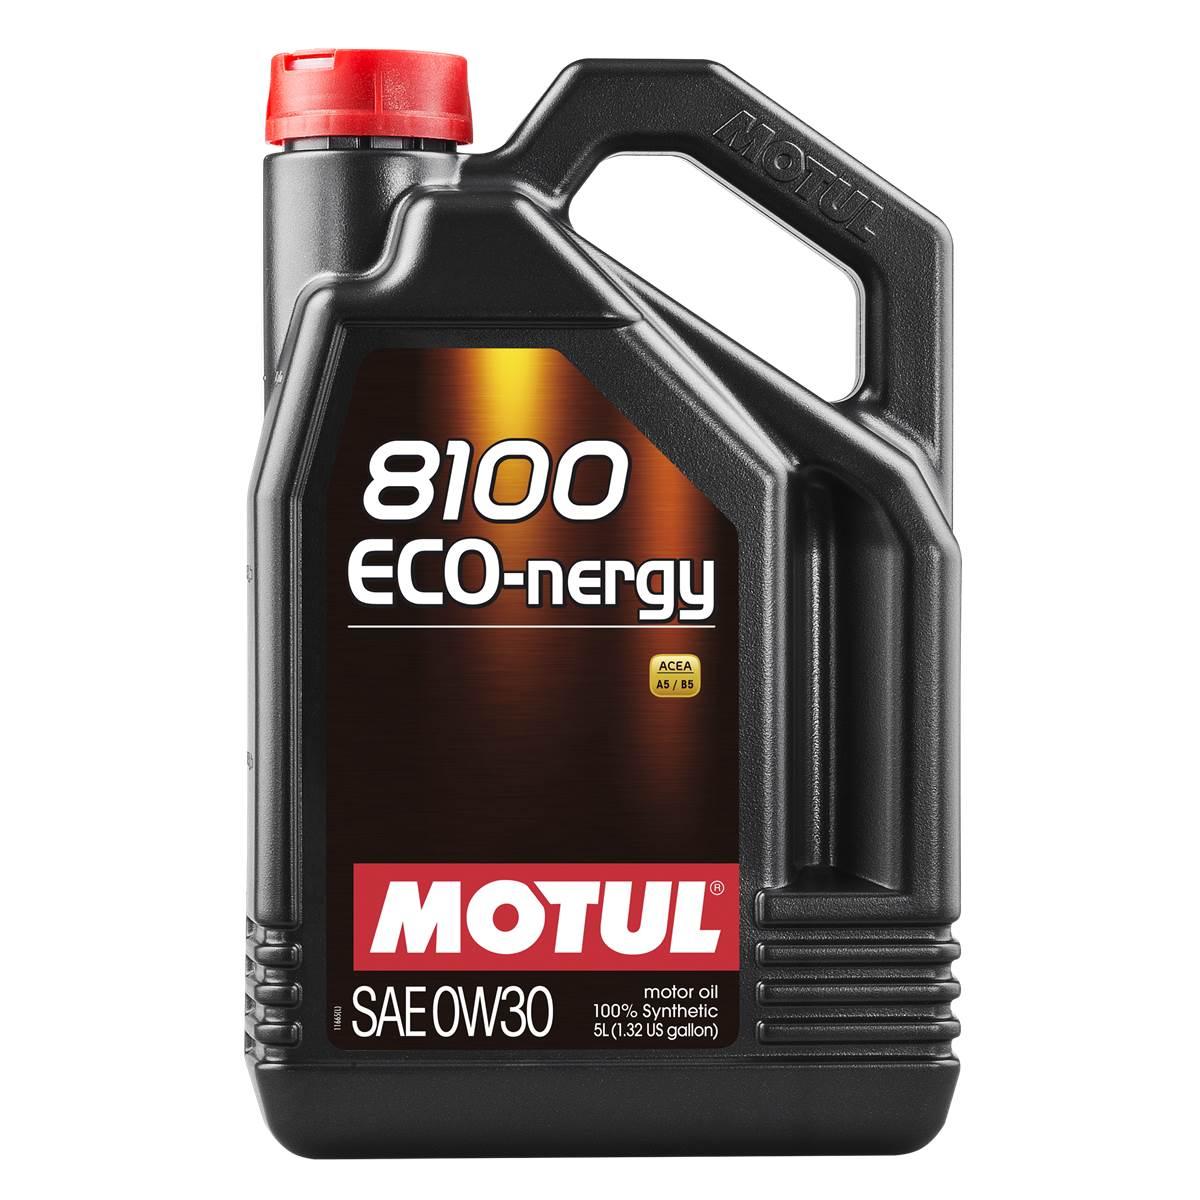 Huile moteur Motul 8100 Eco-Nergy essence/diesel 0W30 5L